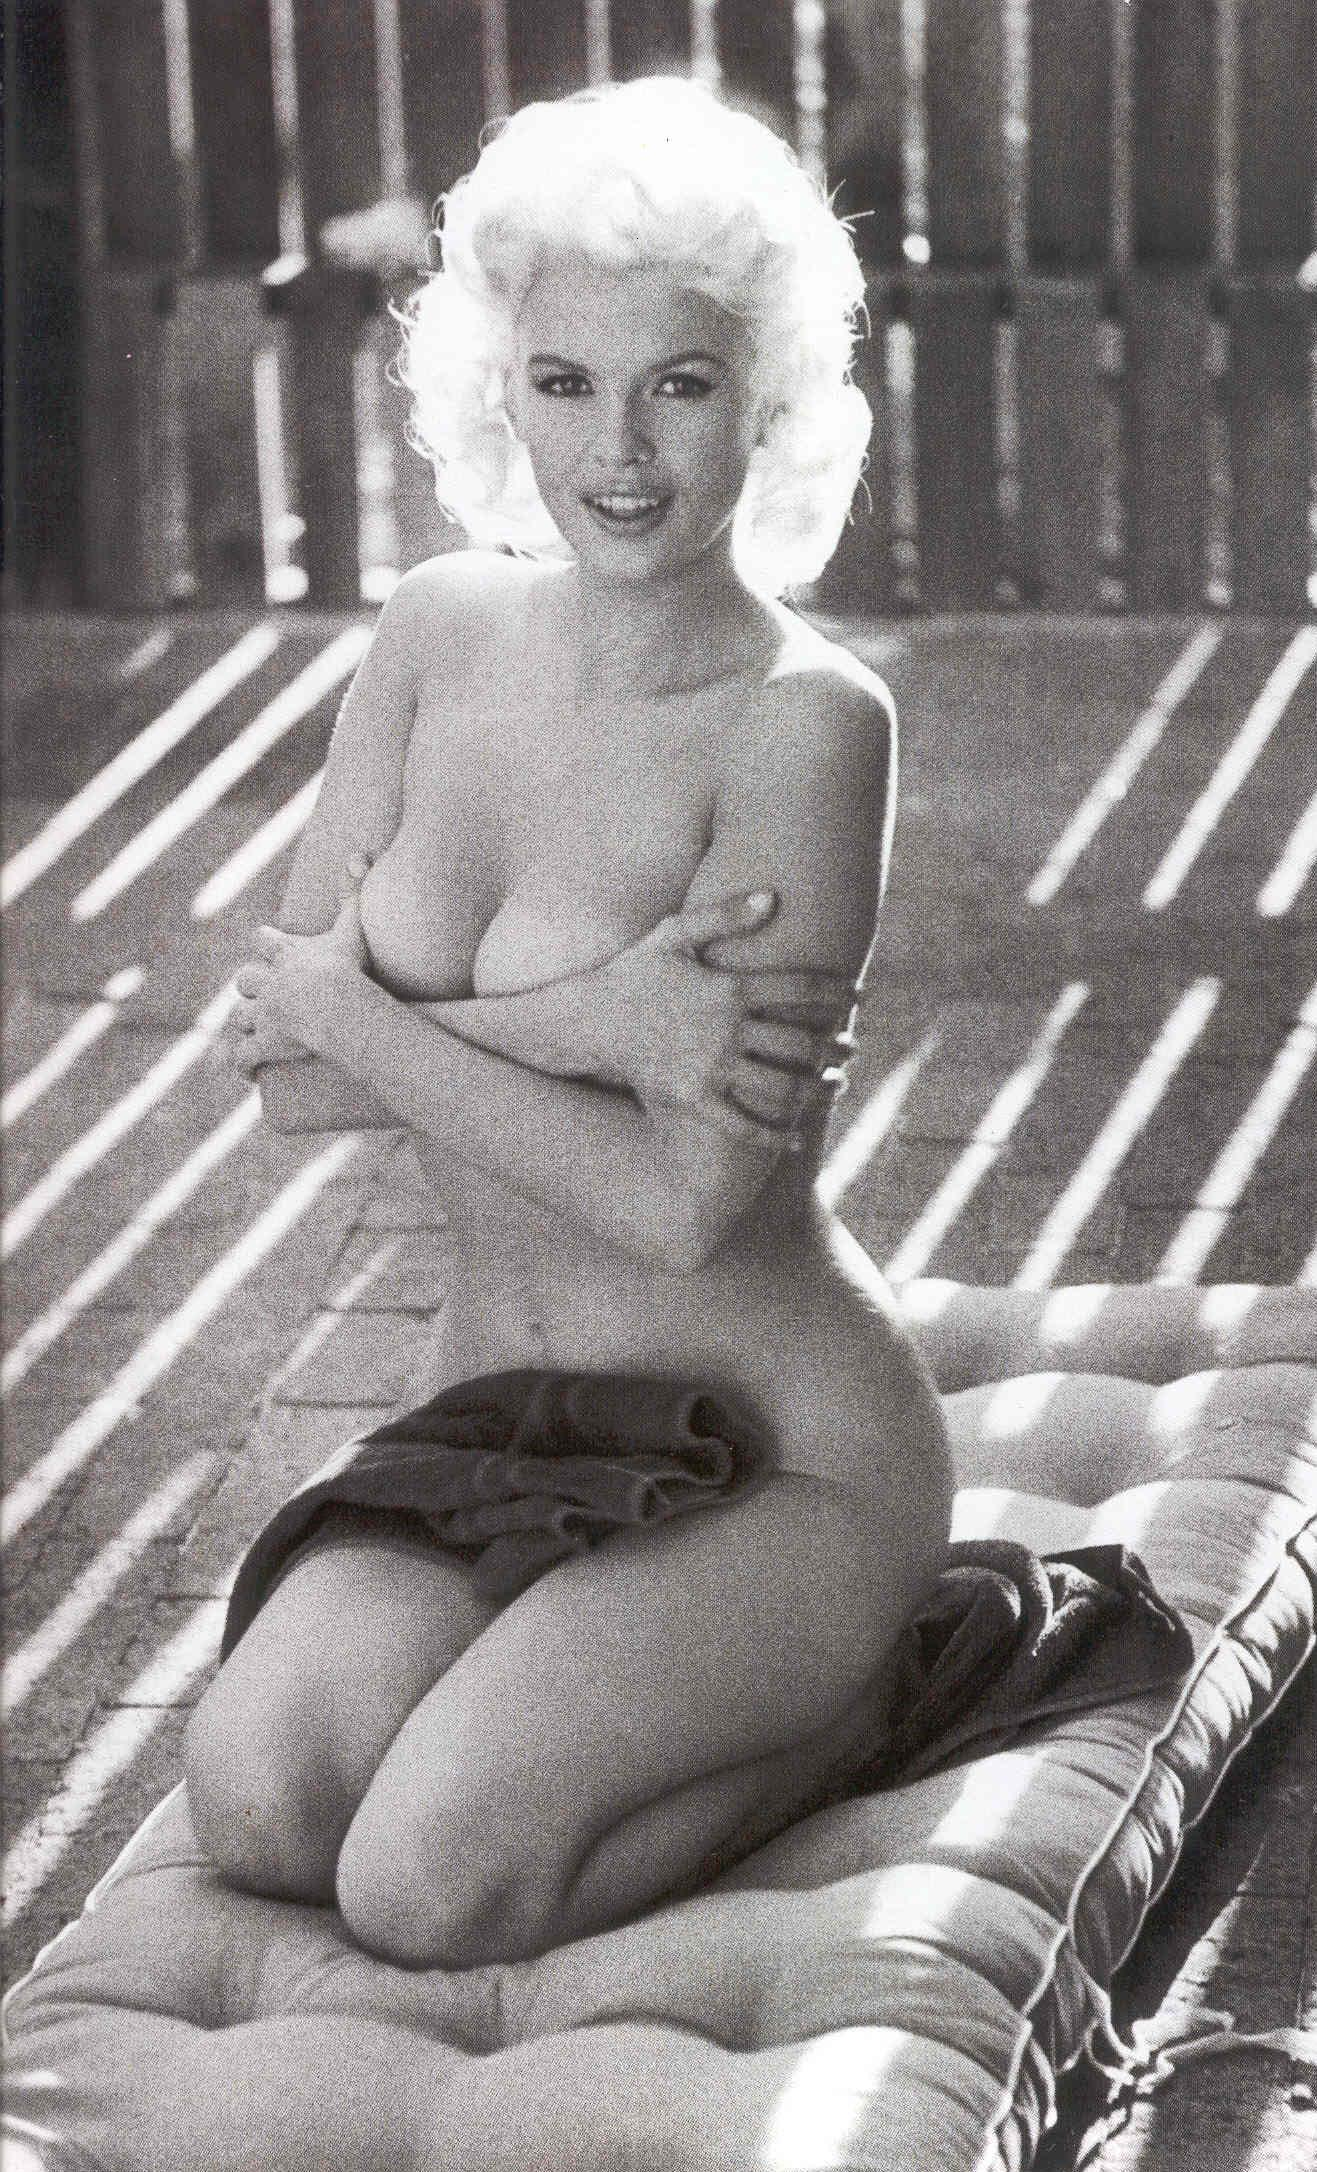 jayne-mansfield-nude-photo-gallery